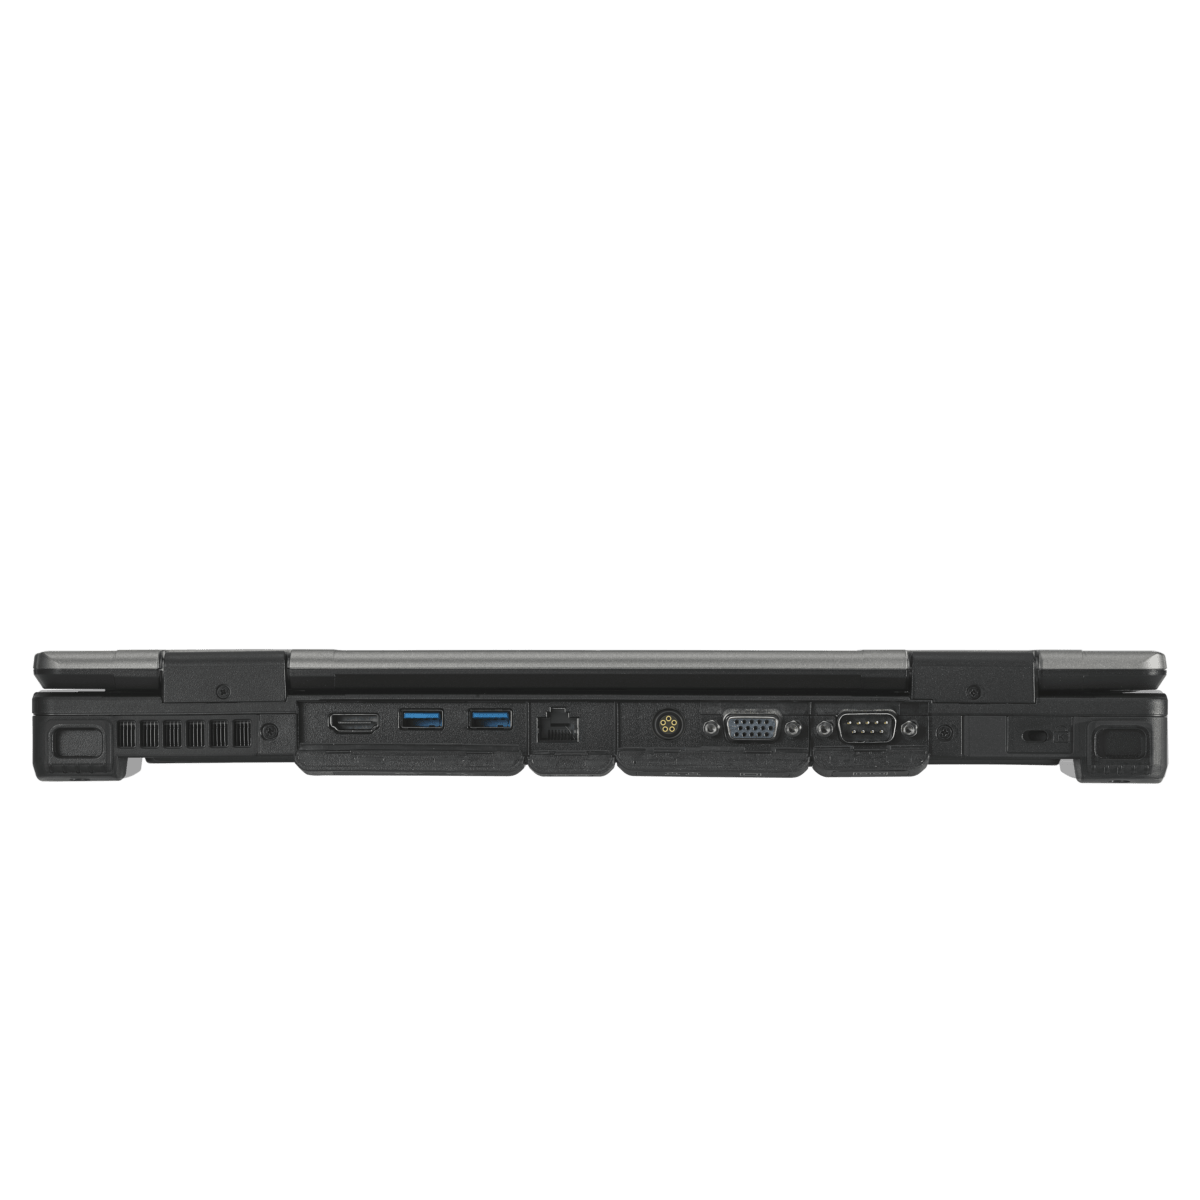 S410-IO-port-Rugged-USB-Getac